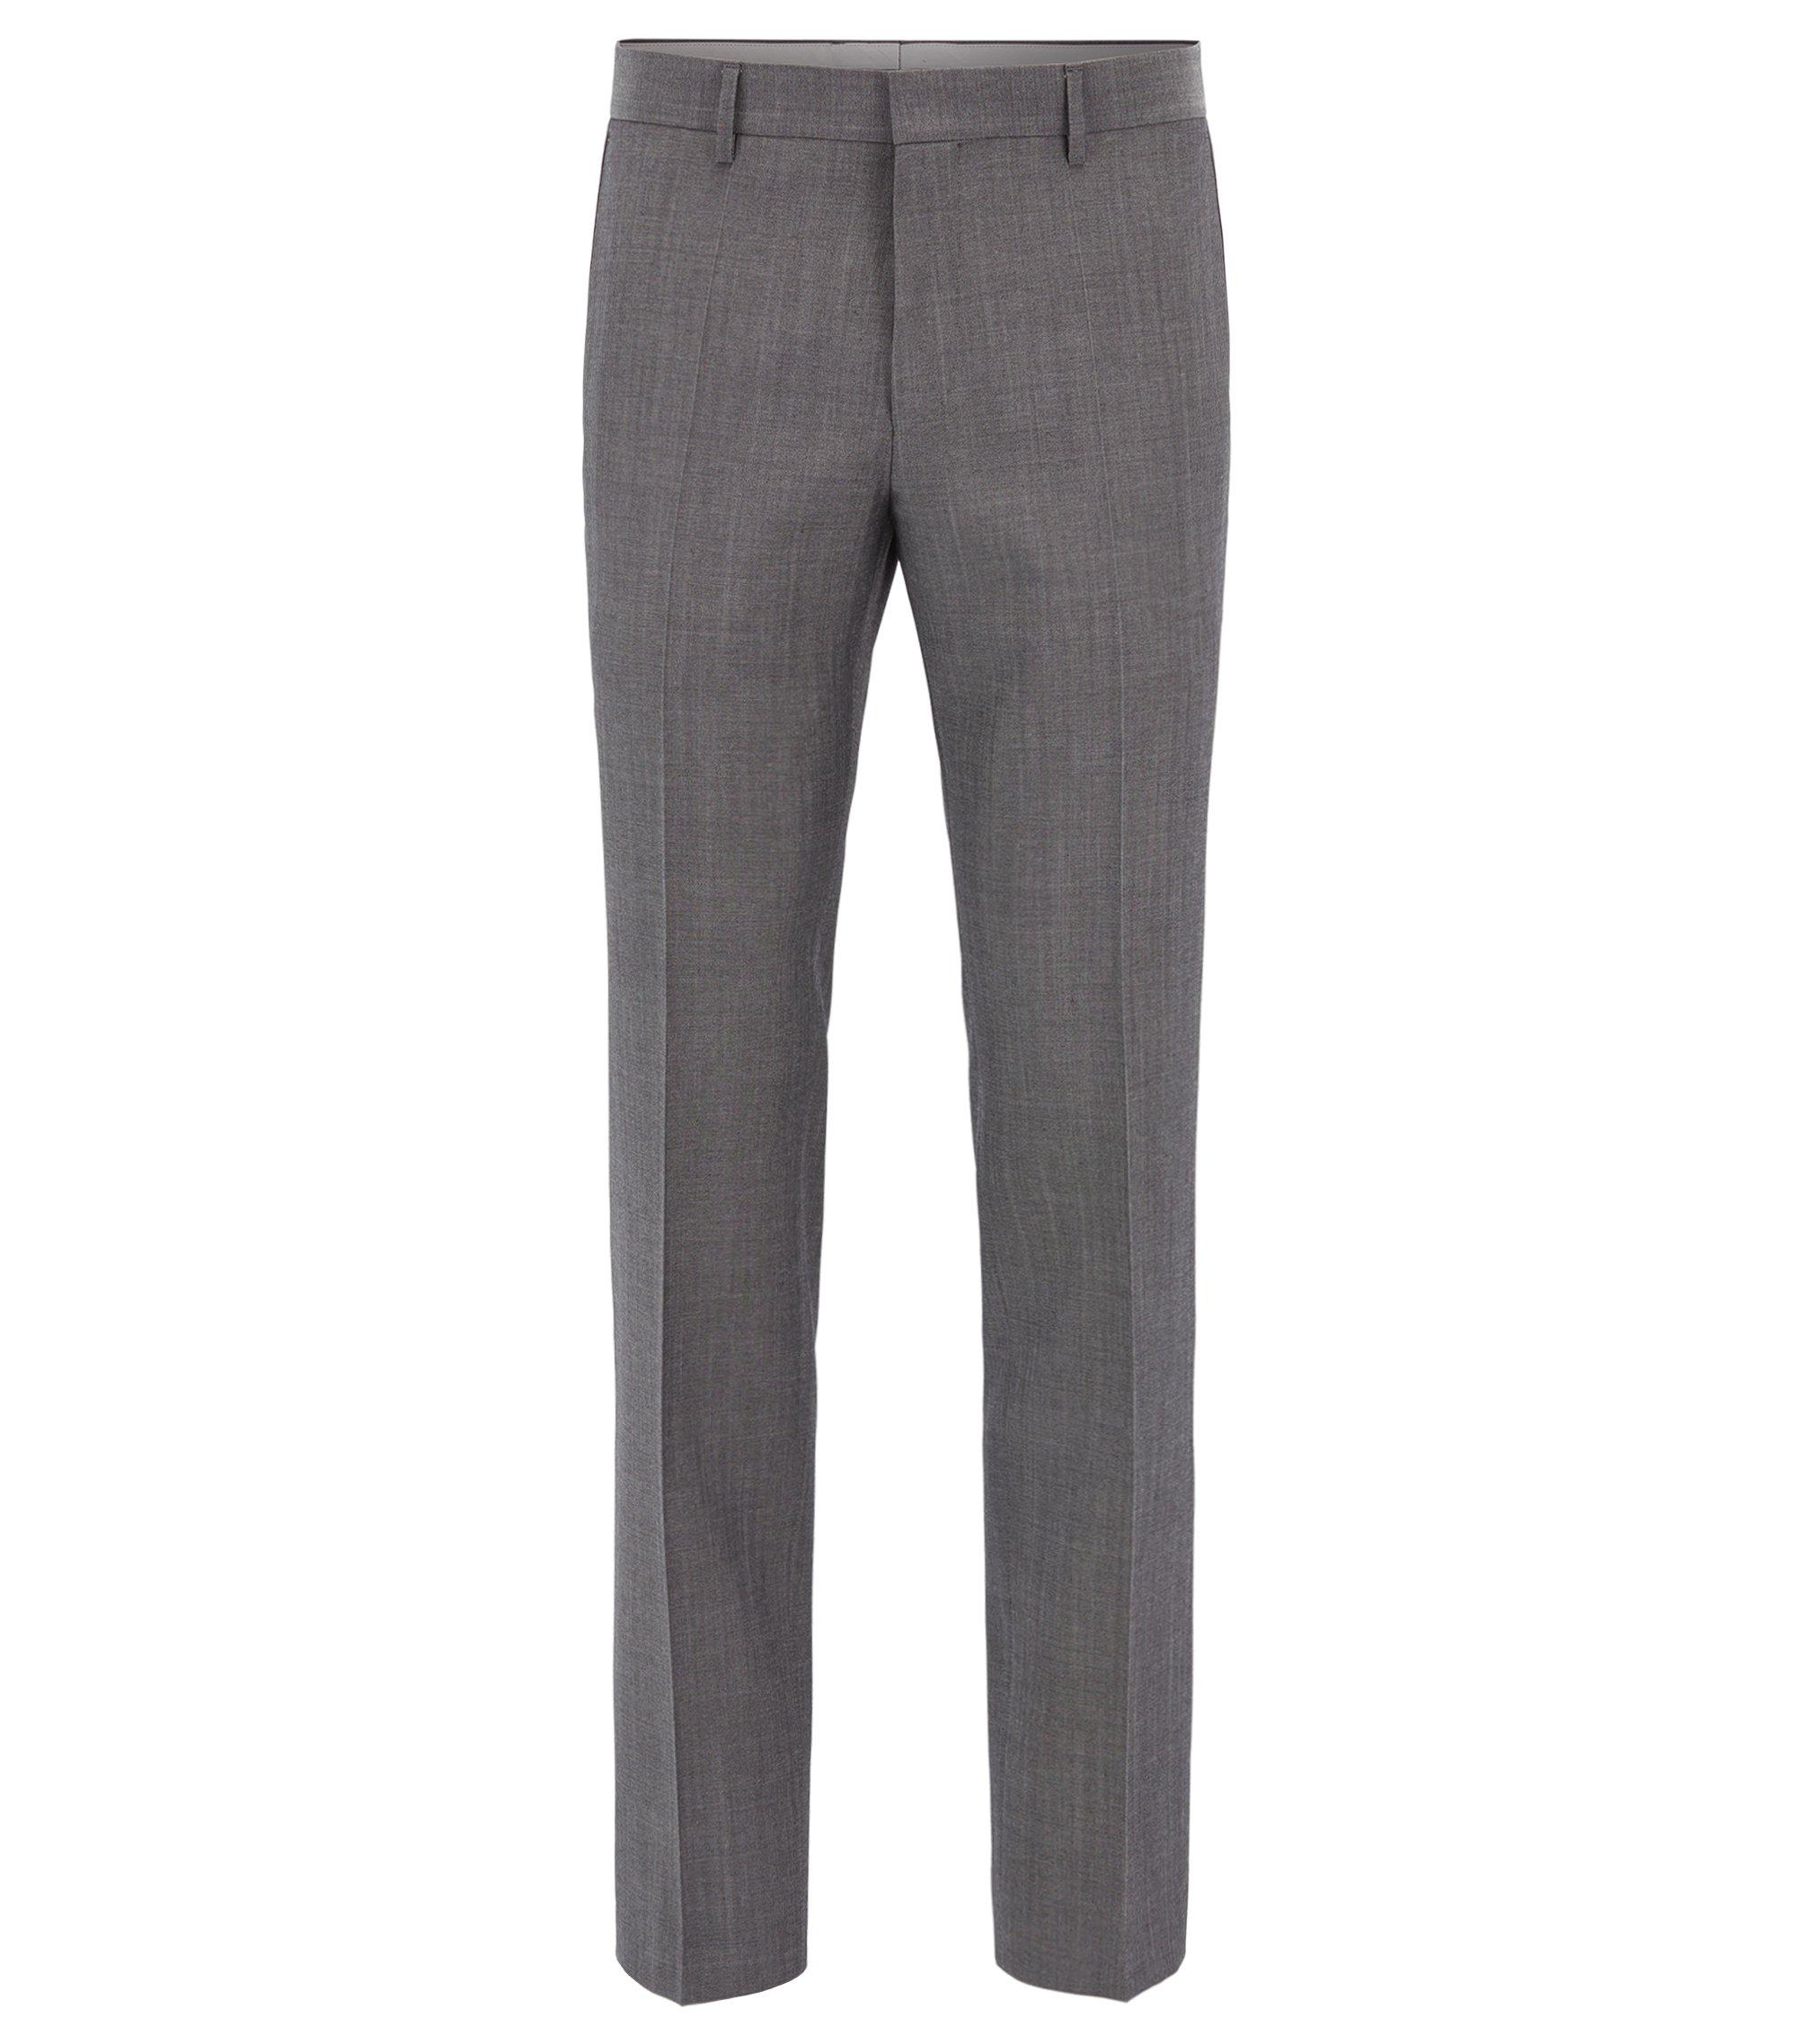 Heather Virgin Wool Dress Pant, Slim Fit | Giro, Grey